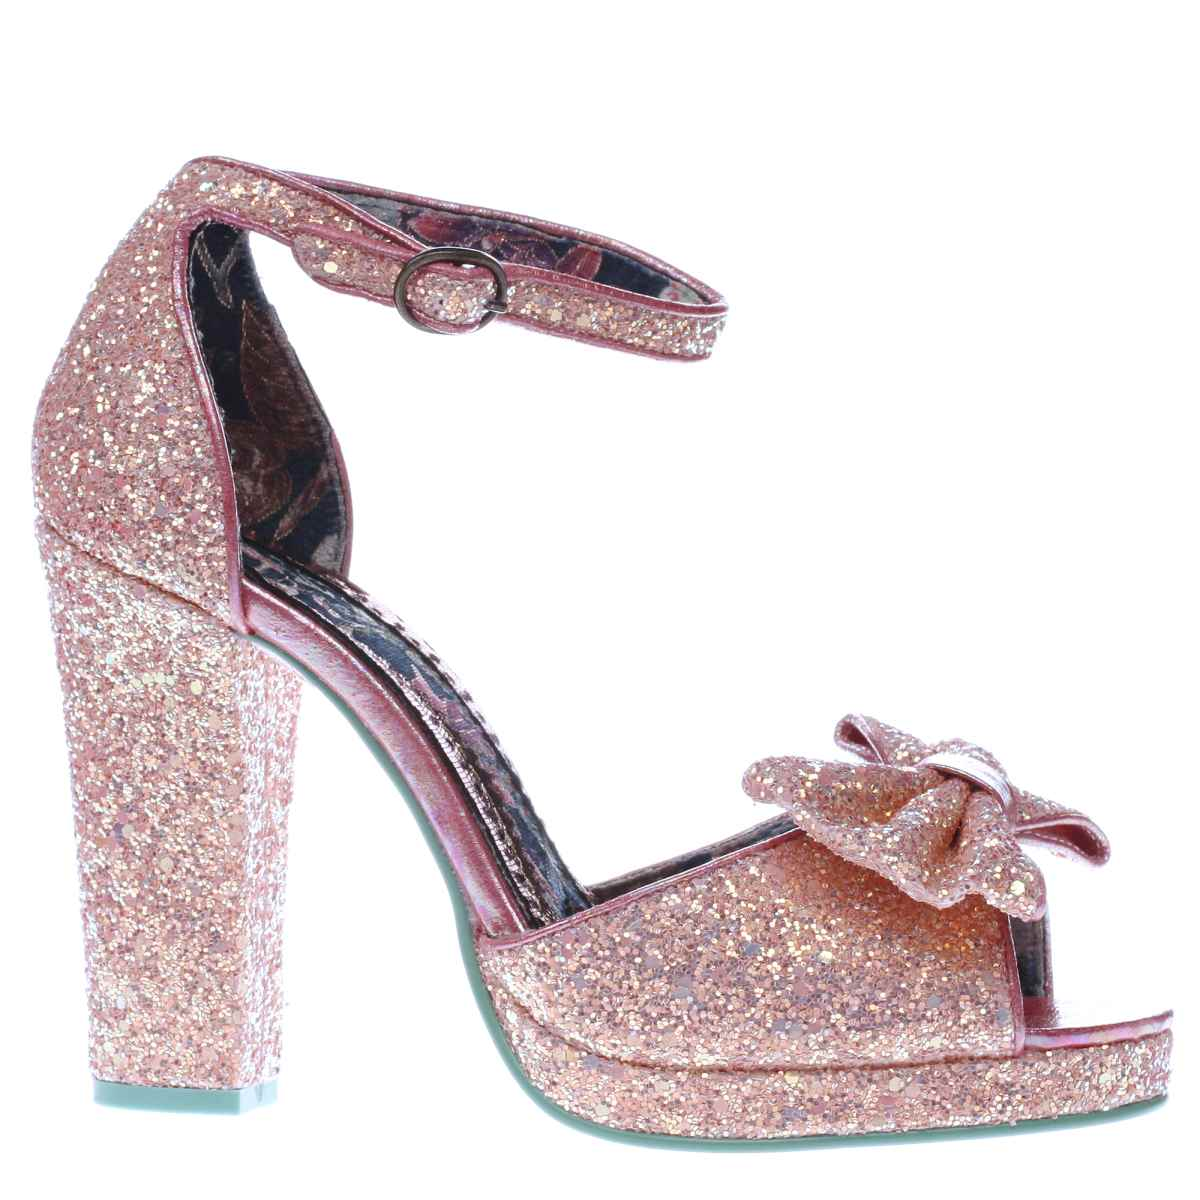 Womens High Heels Sale | Stilettos, Platforms and More | schuh